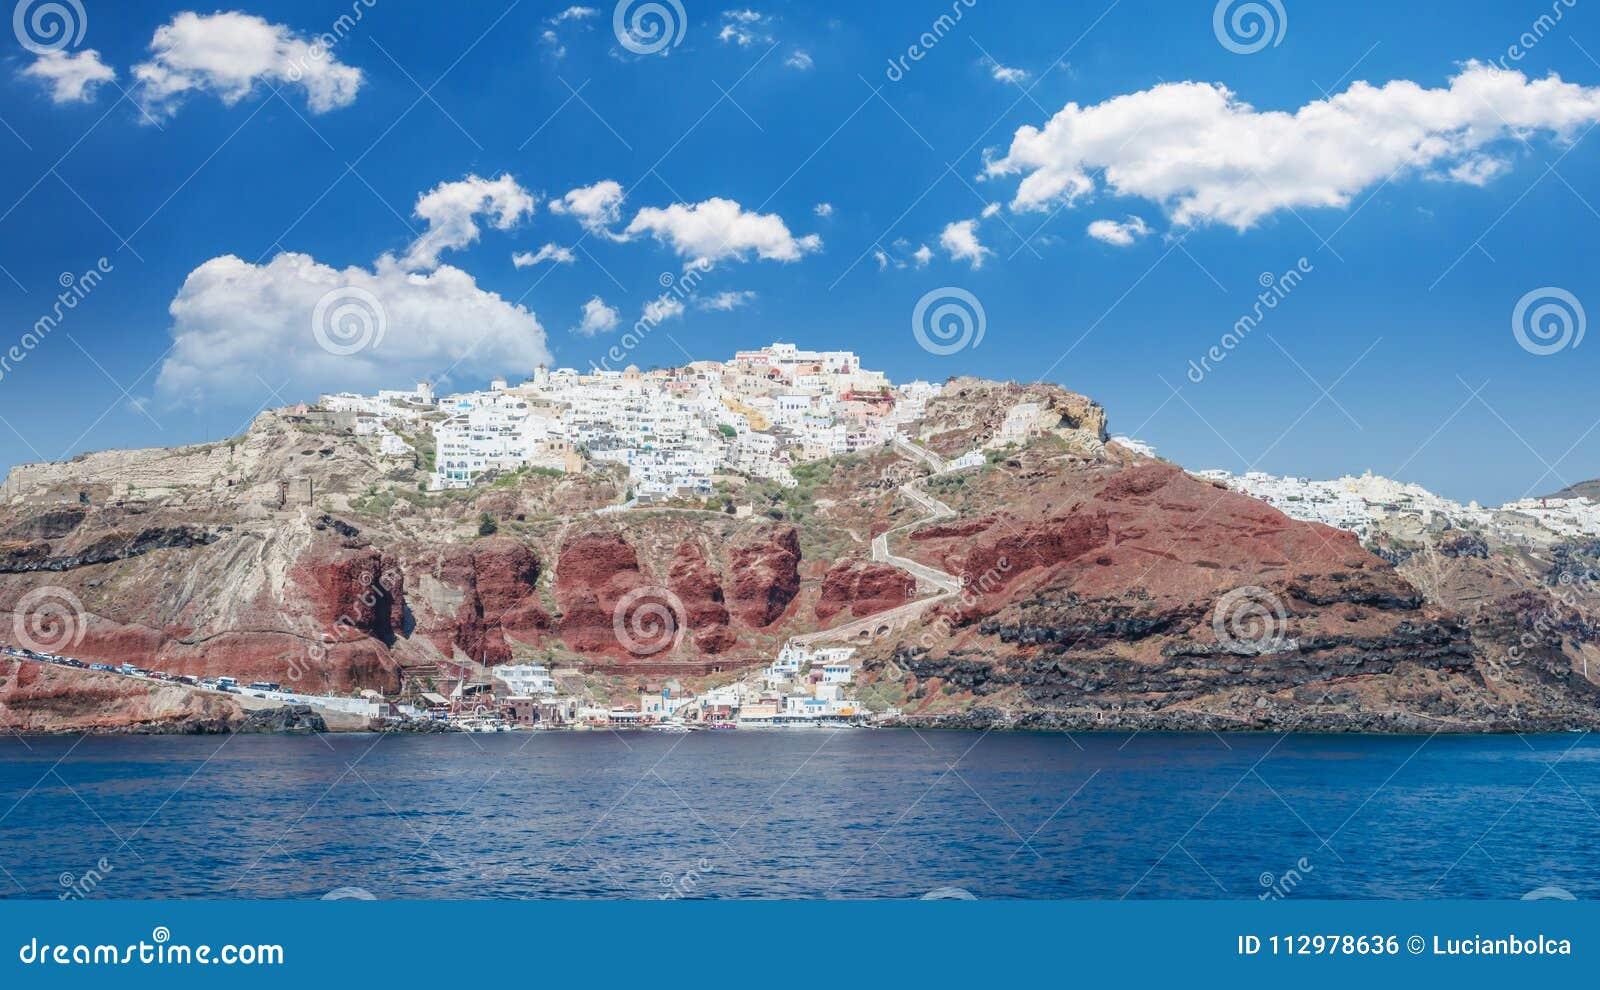 Santorini, Cyclades Islands, Greece.